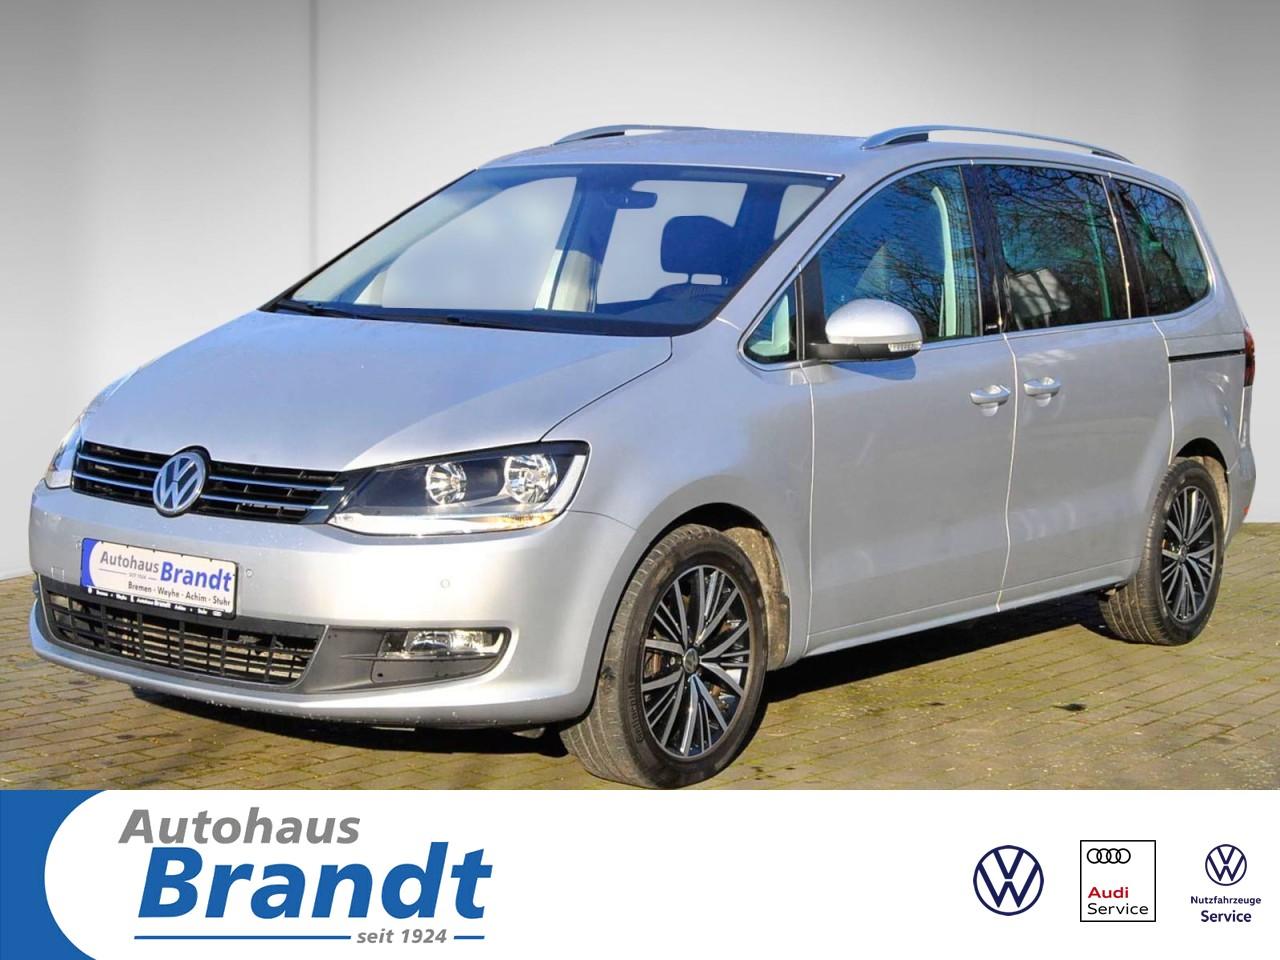 Volkswagen Sharan 2.0 TDI Allstar NAVI*ACC Klima Navi, Jahr 2016, Diesel